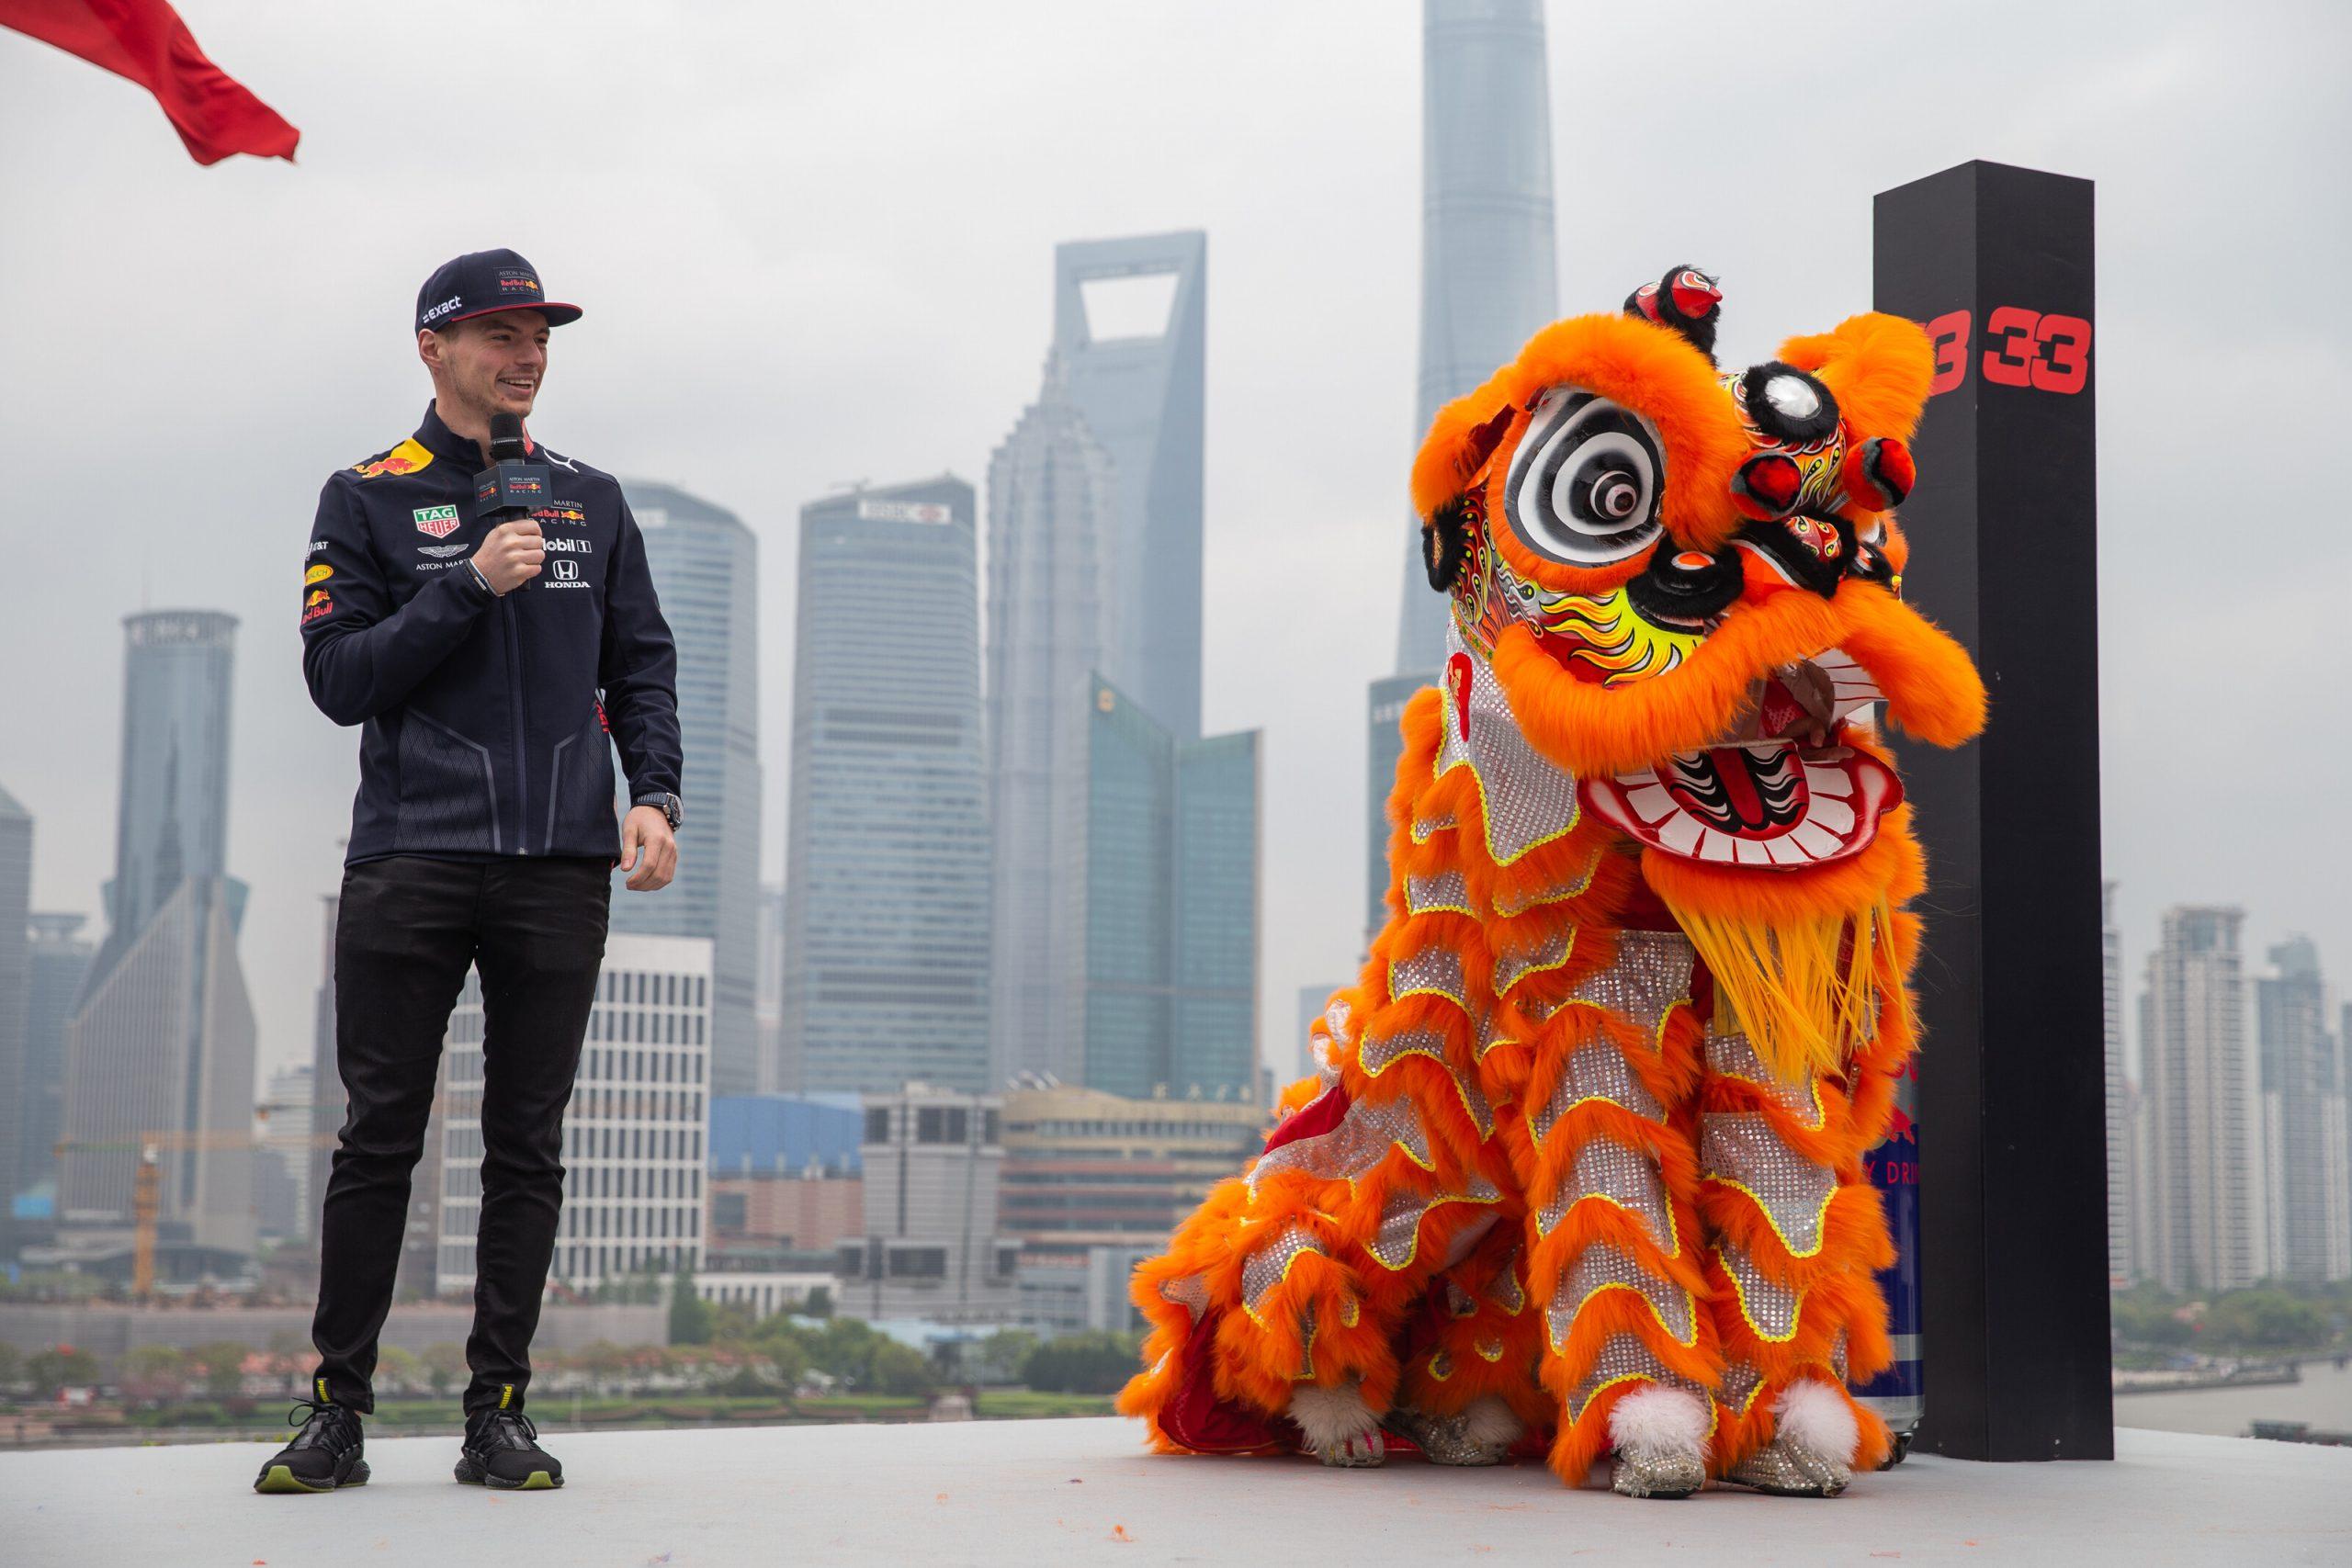 grand prix de Chine Max Verstappen 2019